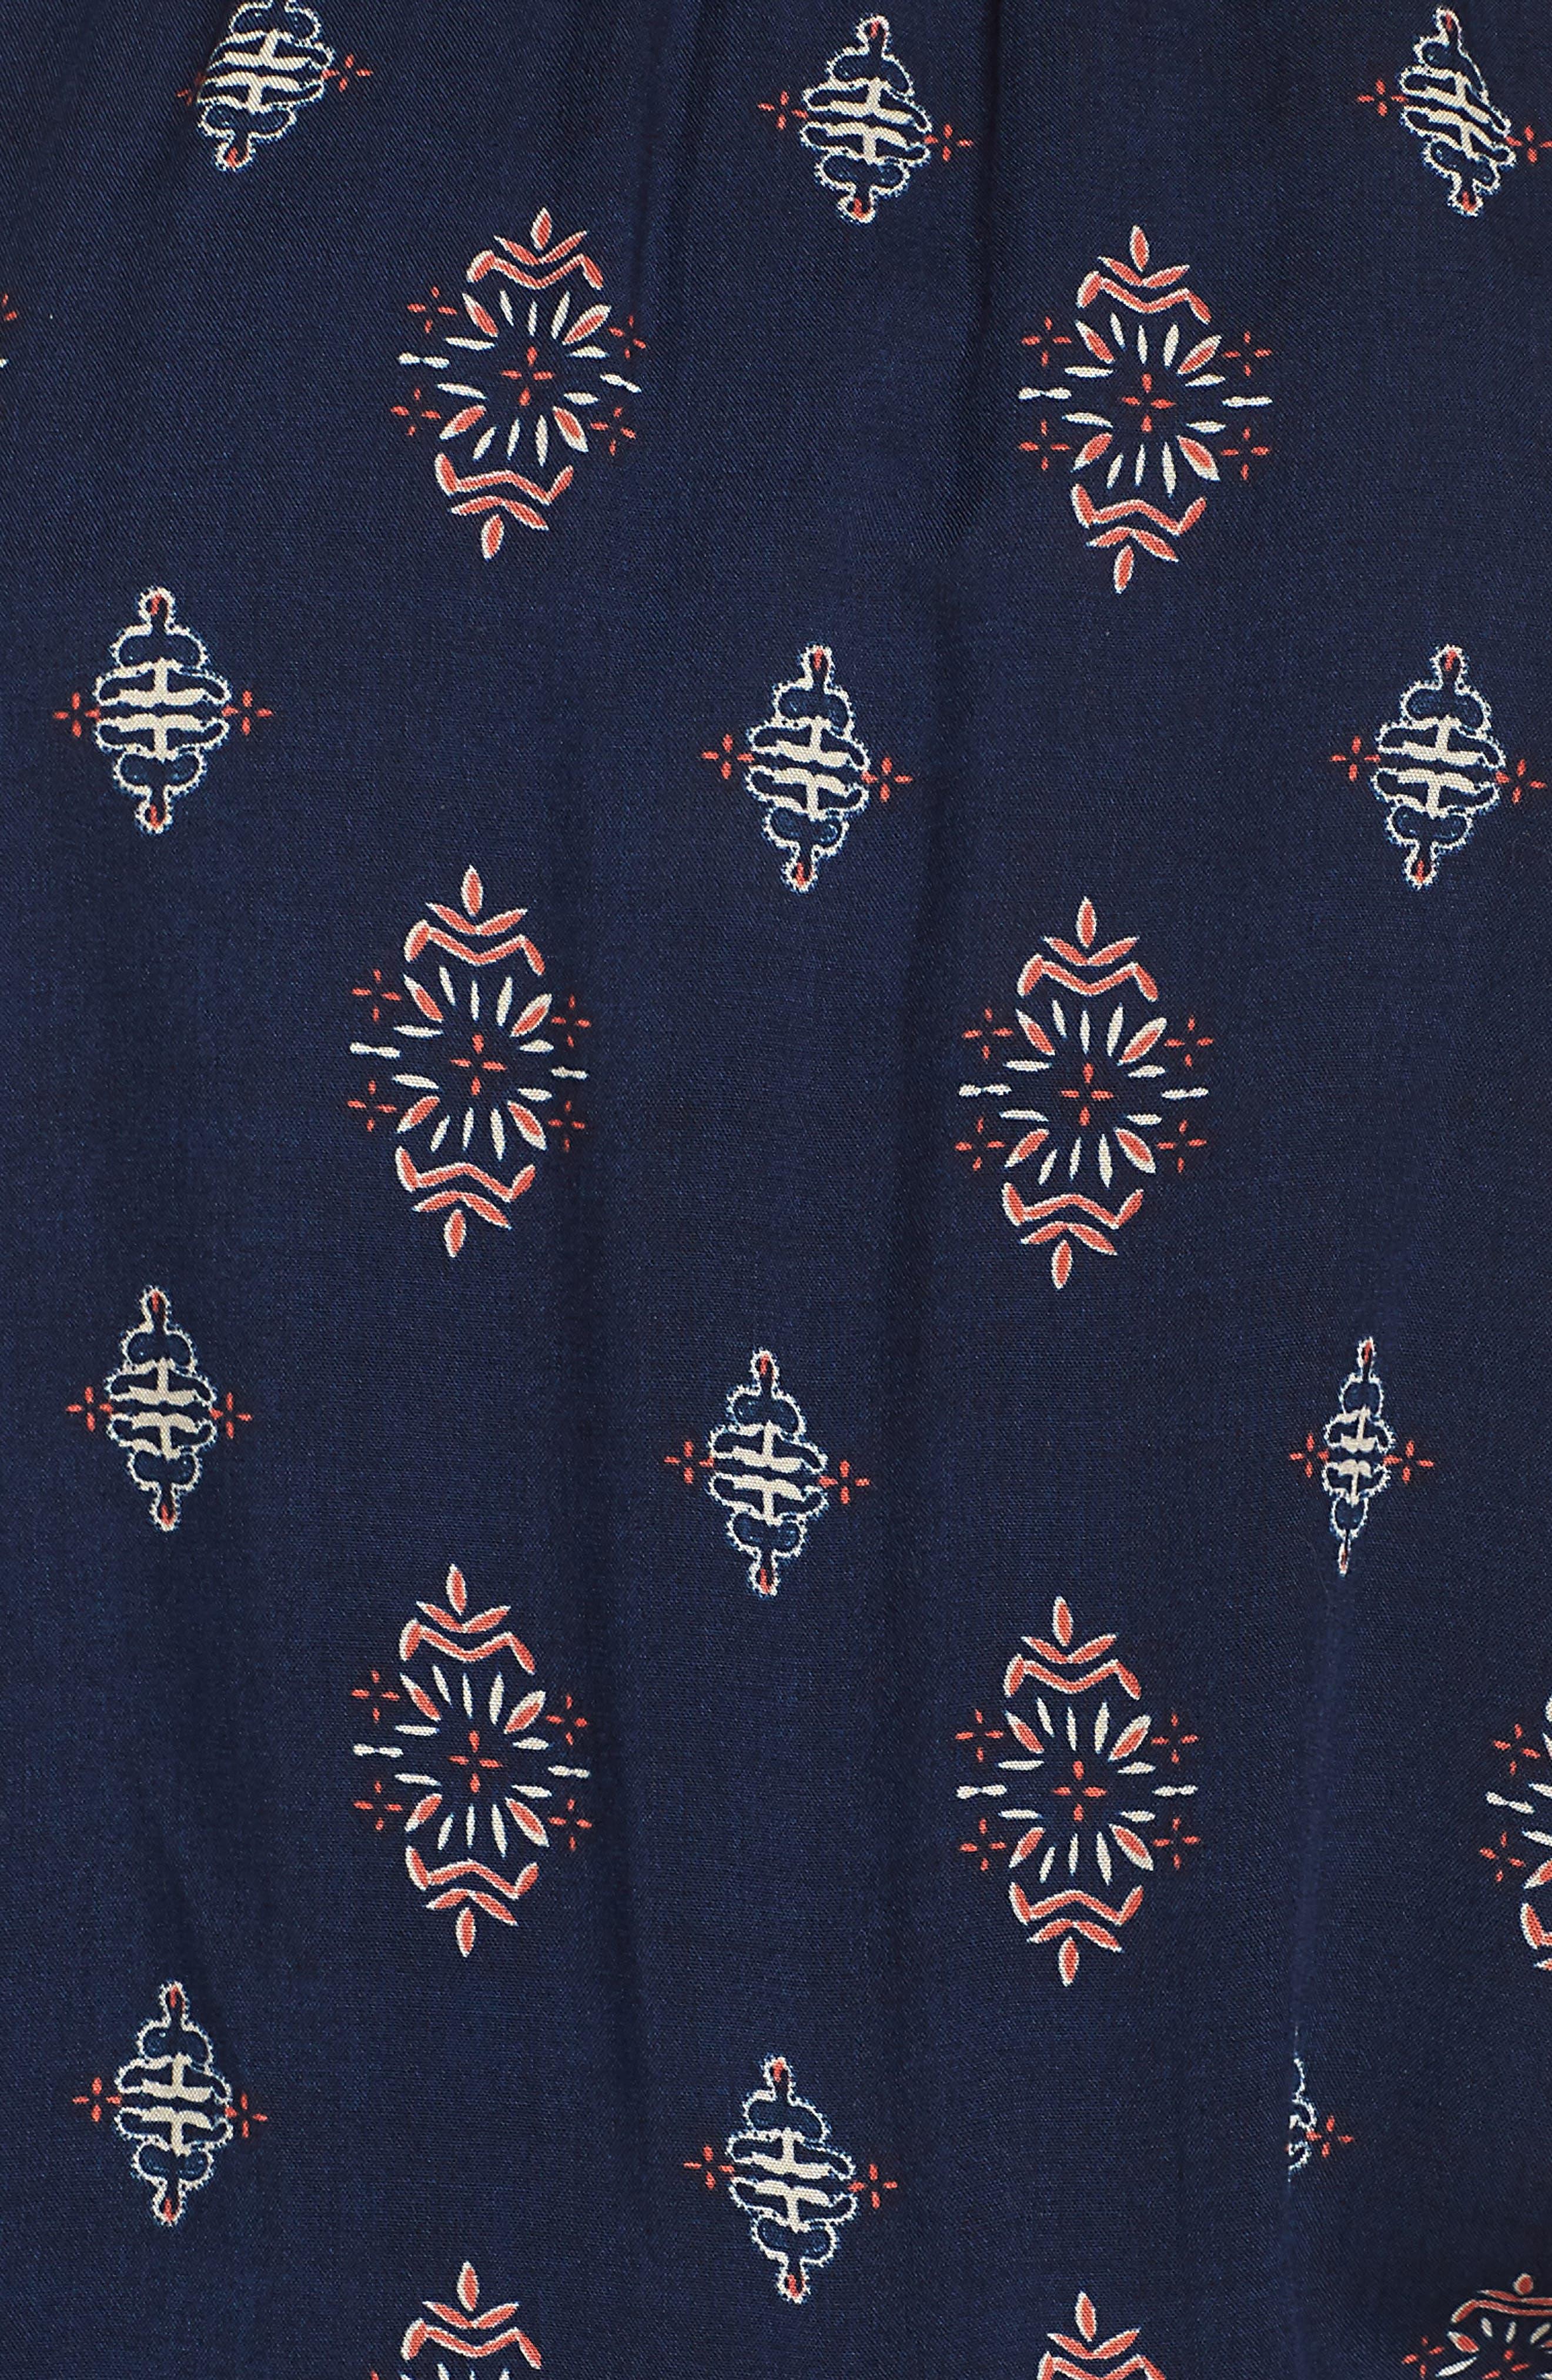 Off the Shoulder Cover-Up Romper,                             Alternate thumbnail 5, color,                             Navy Ornate